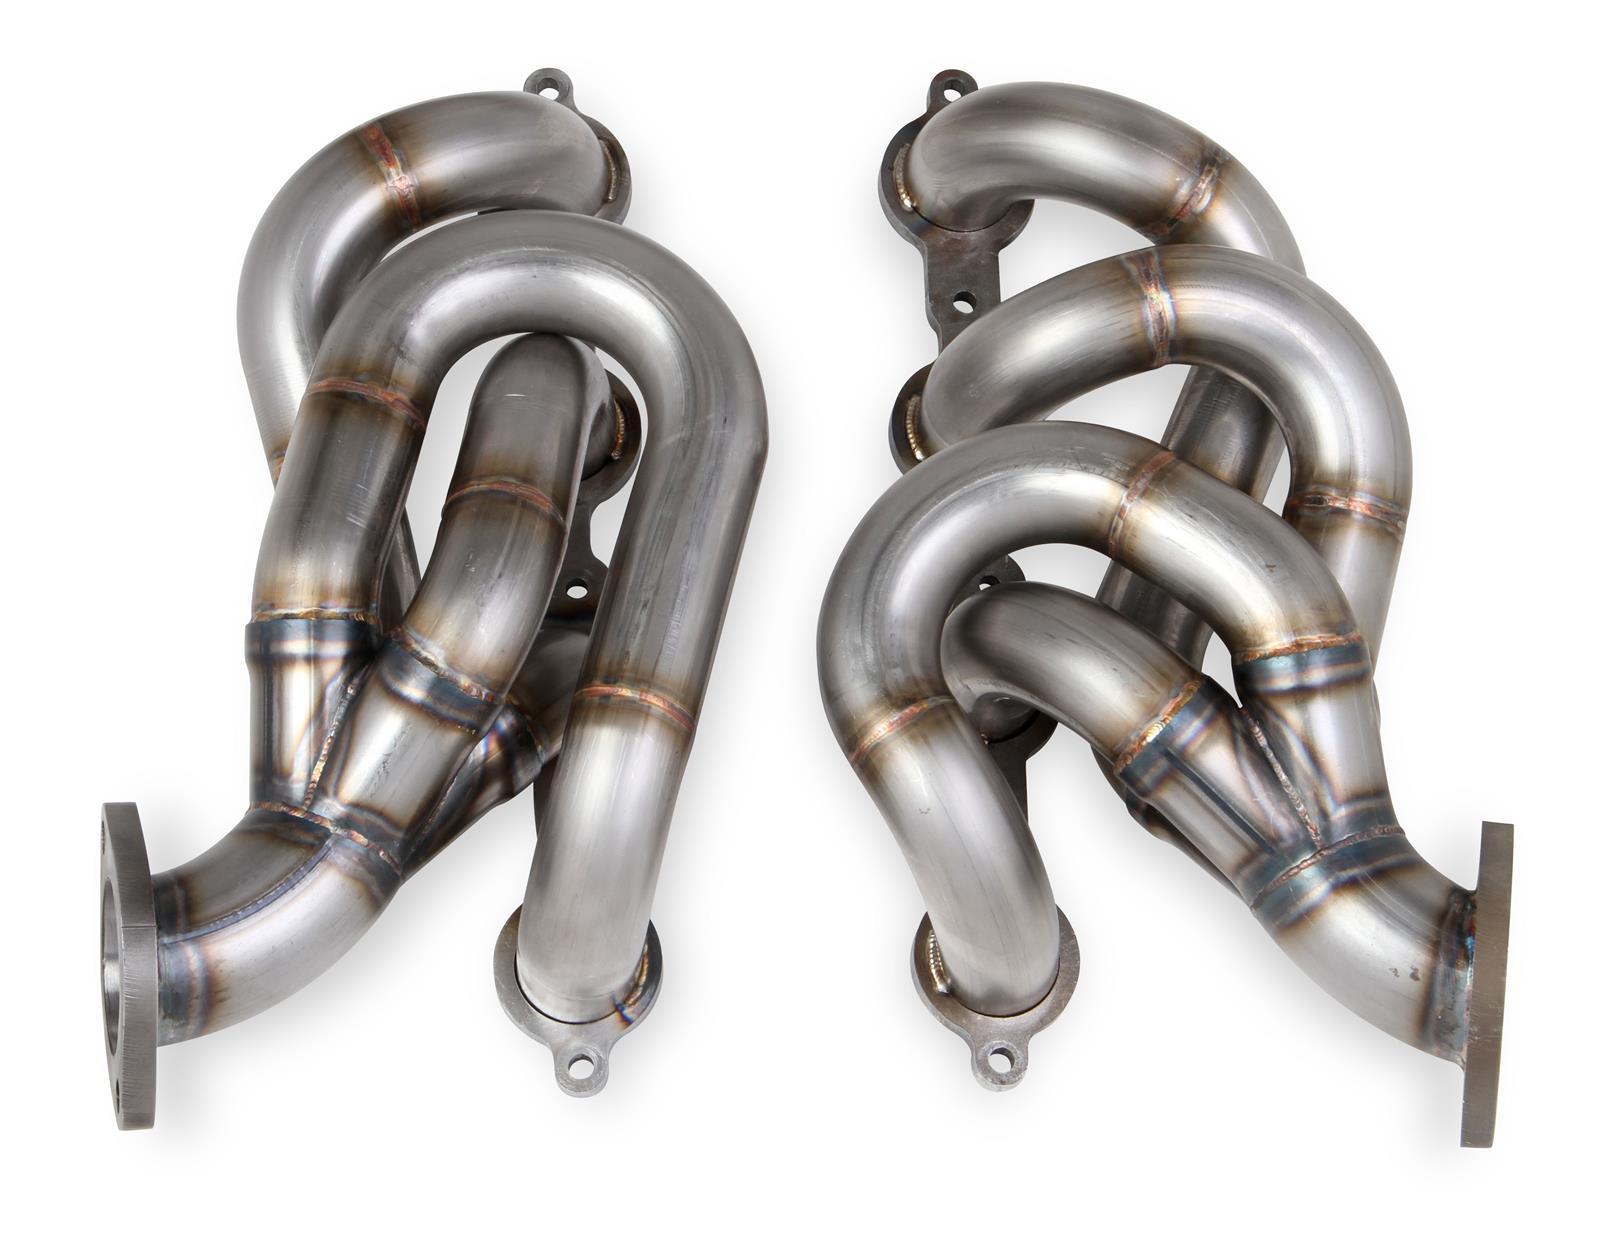 Hooker 70305402 Gaskets Stainless Steel Shorty Style Headers